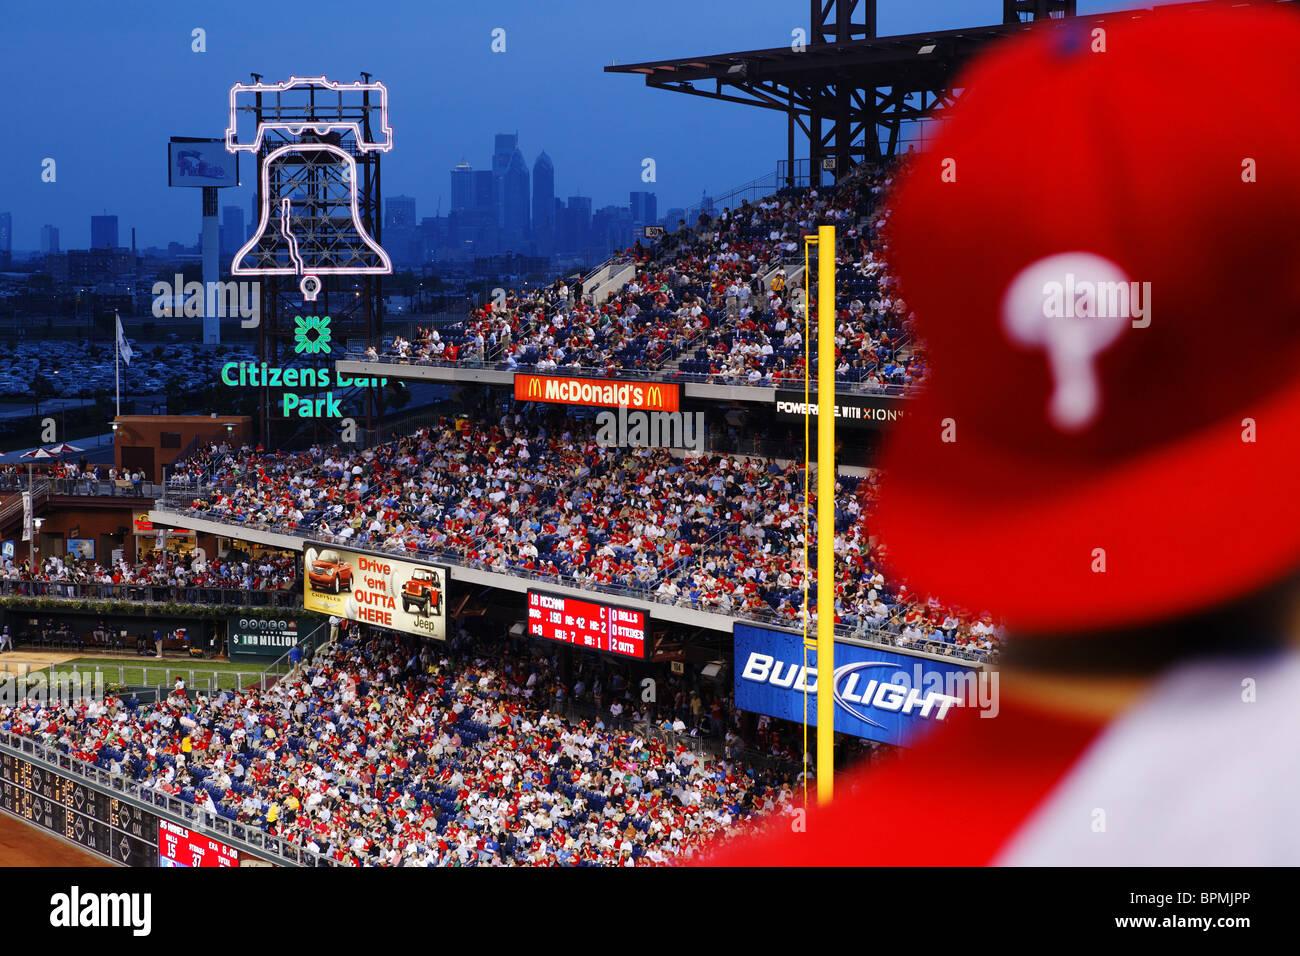 Baseball match between the Phillies and the Atlanta Braves, Downtown Philadelphia in the back, Philadelphia, Pennsylvania, - Stock Image